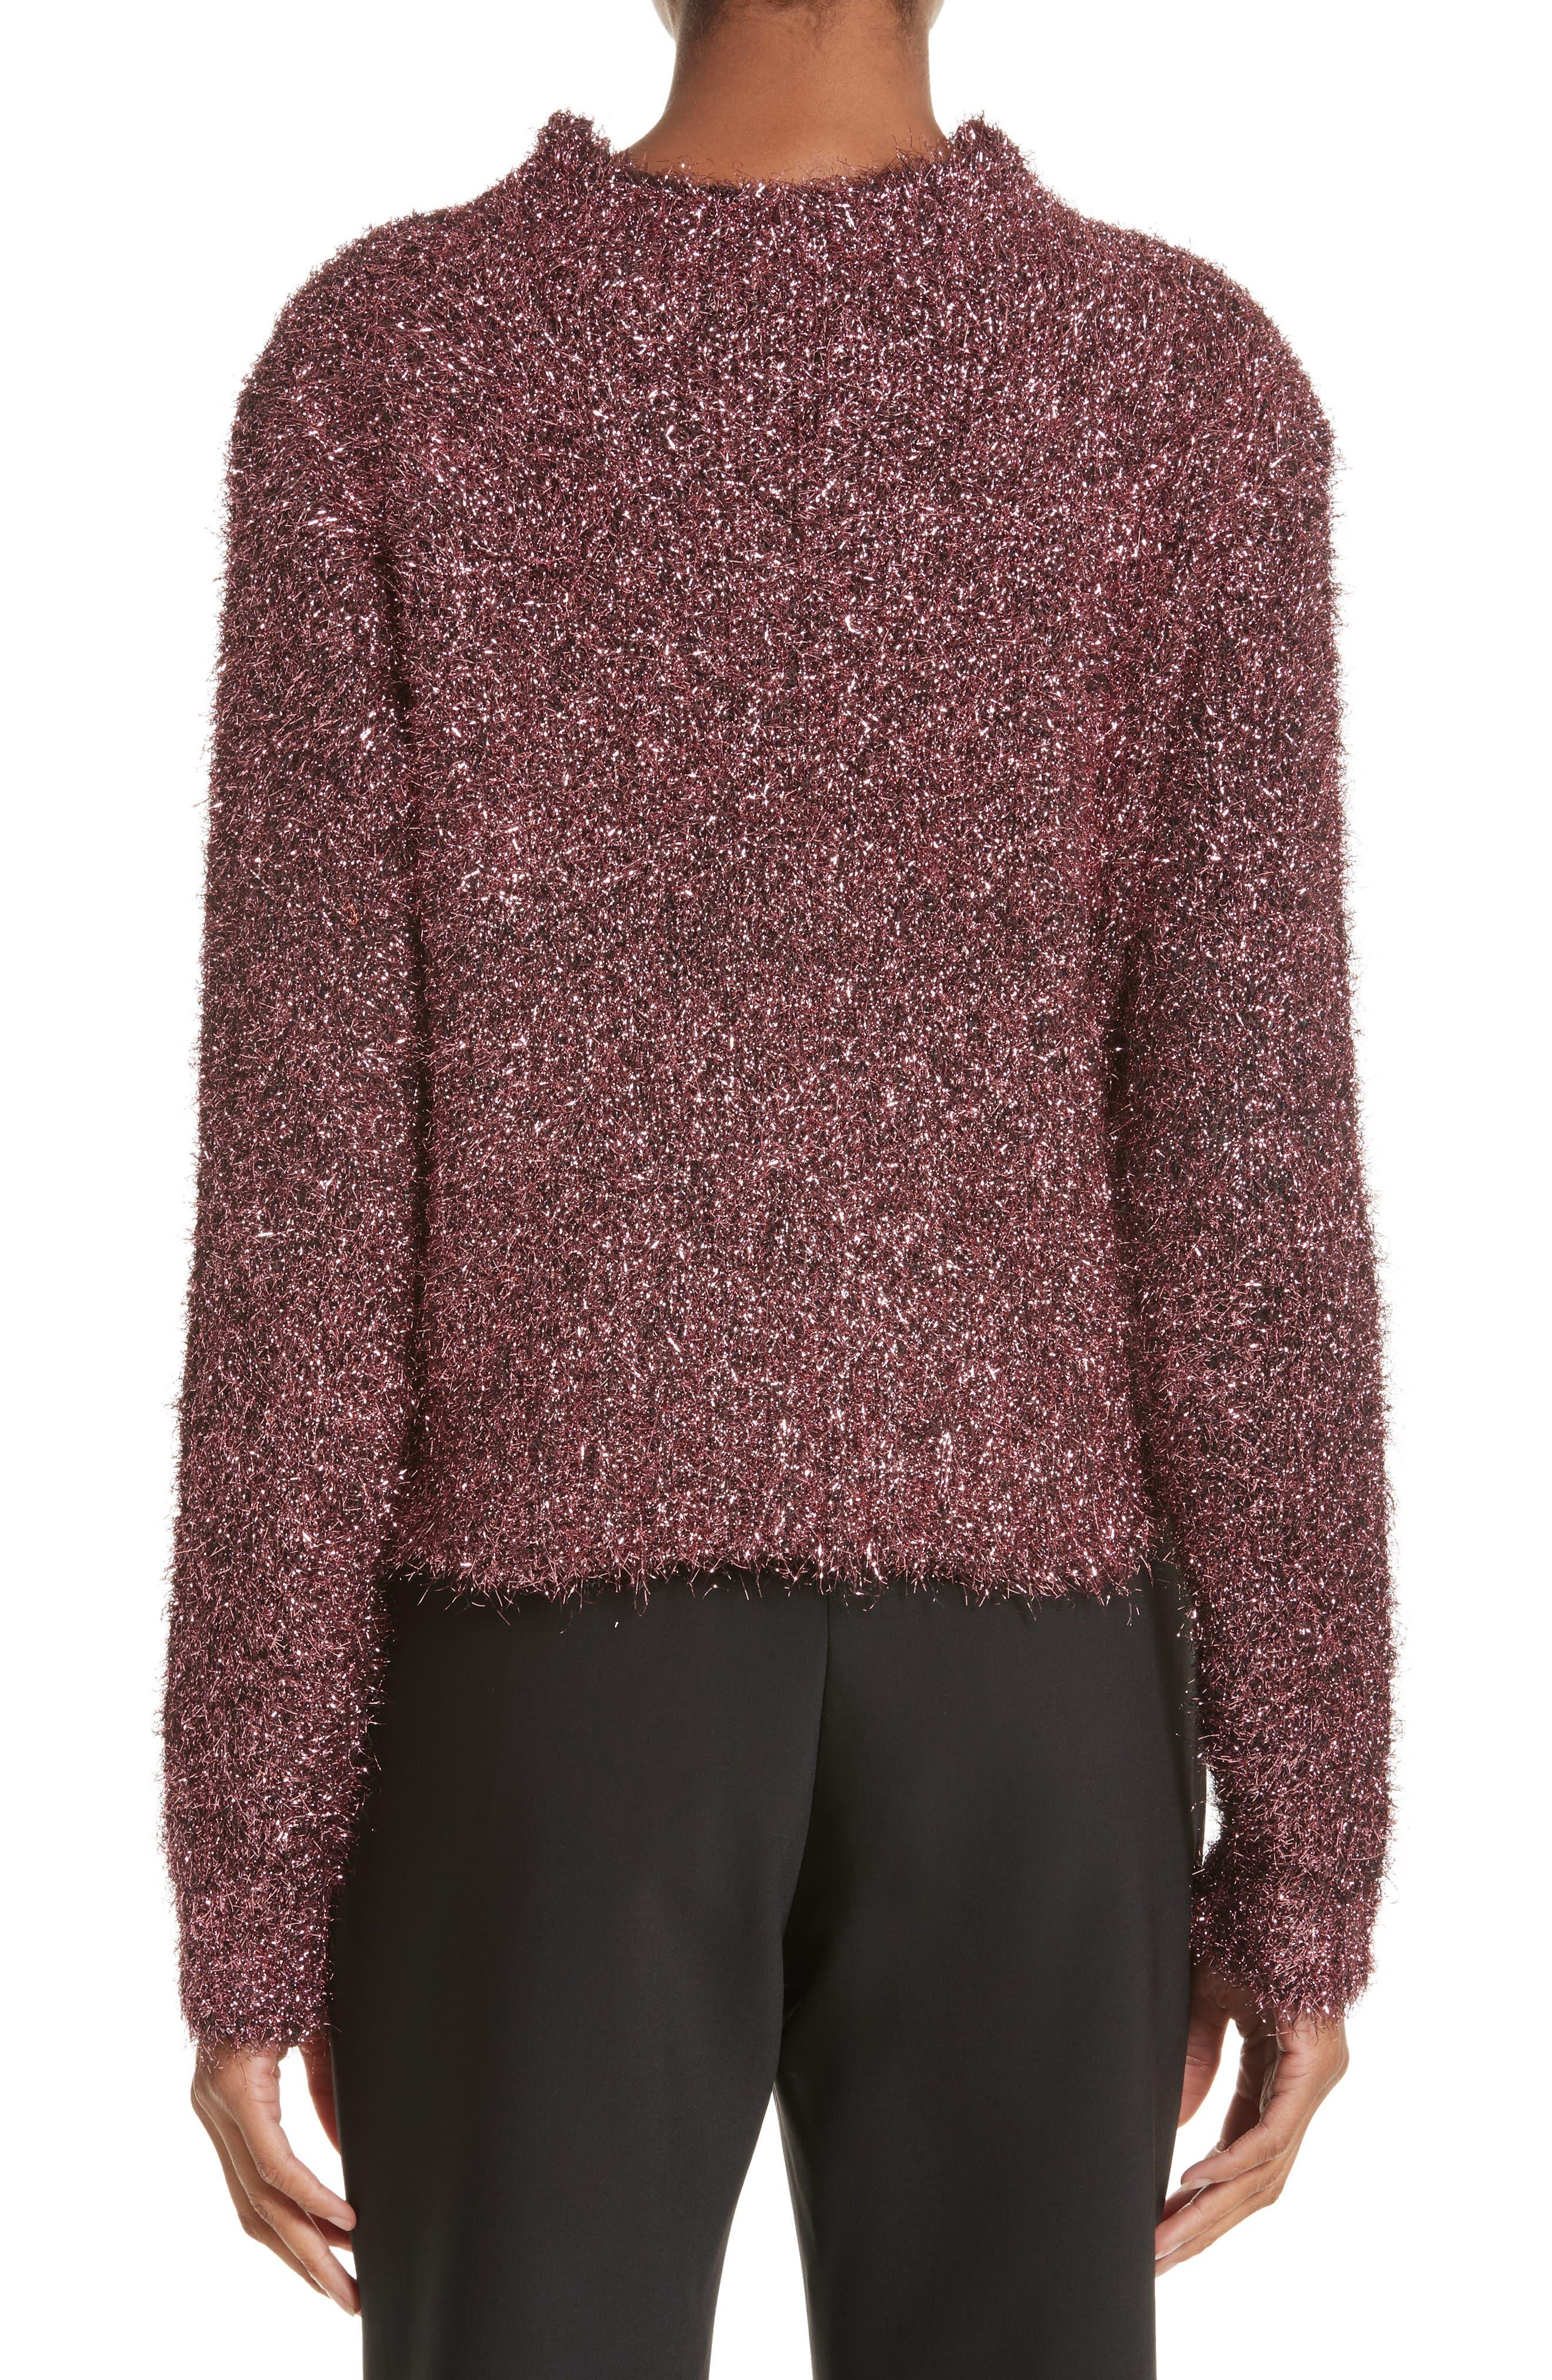 Vaporize Textured Metallic Sweater,                             Alternate thumbnail 2, color,                             650